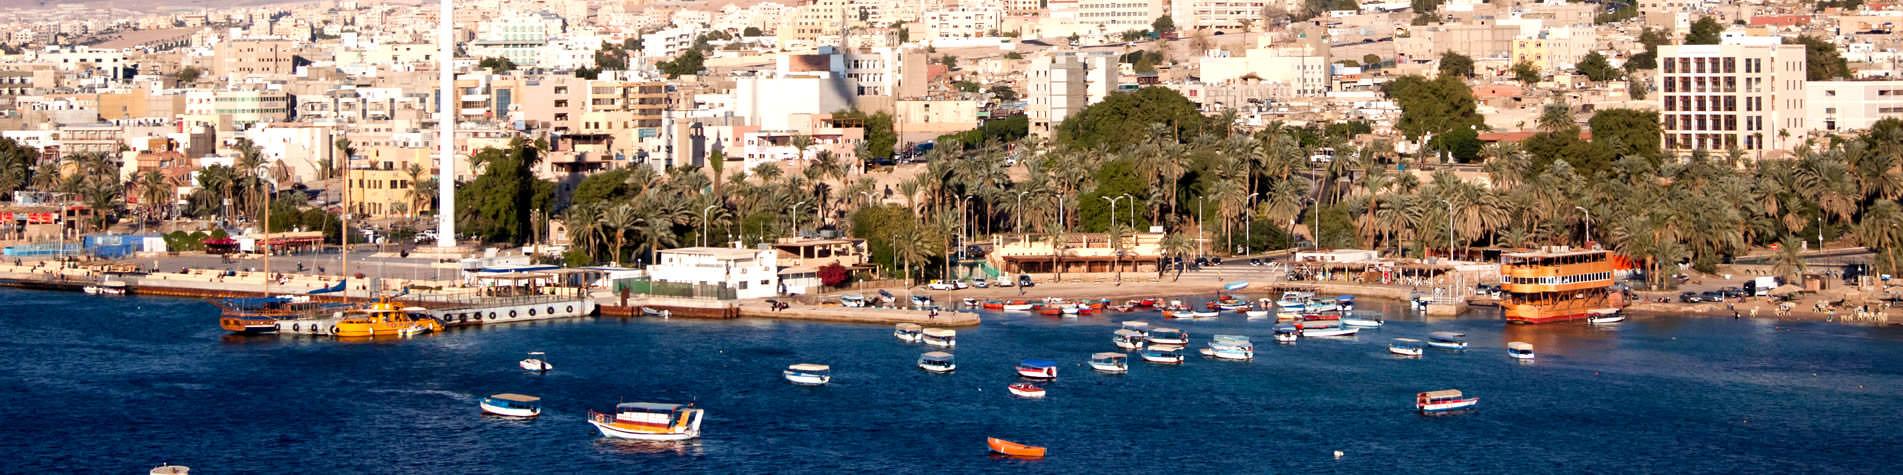 Aqaba Holidays with Cyplon Holidays